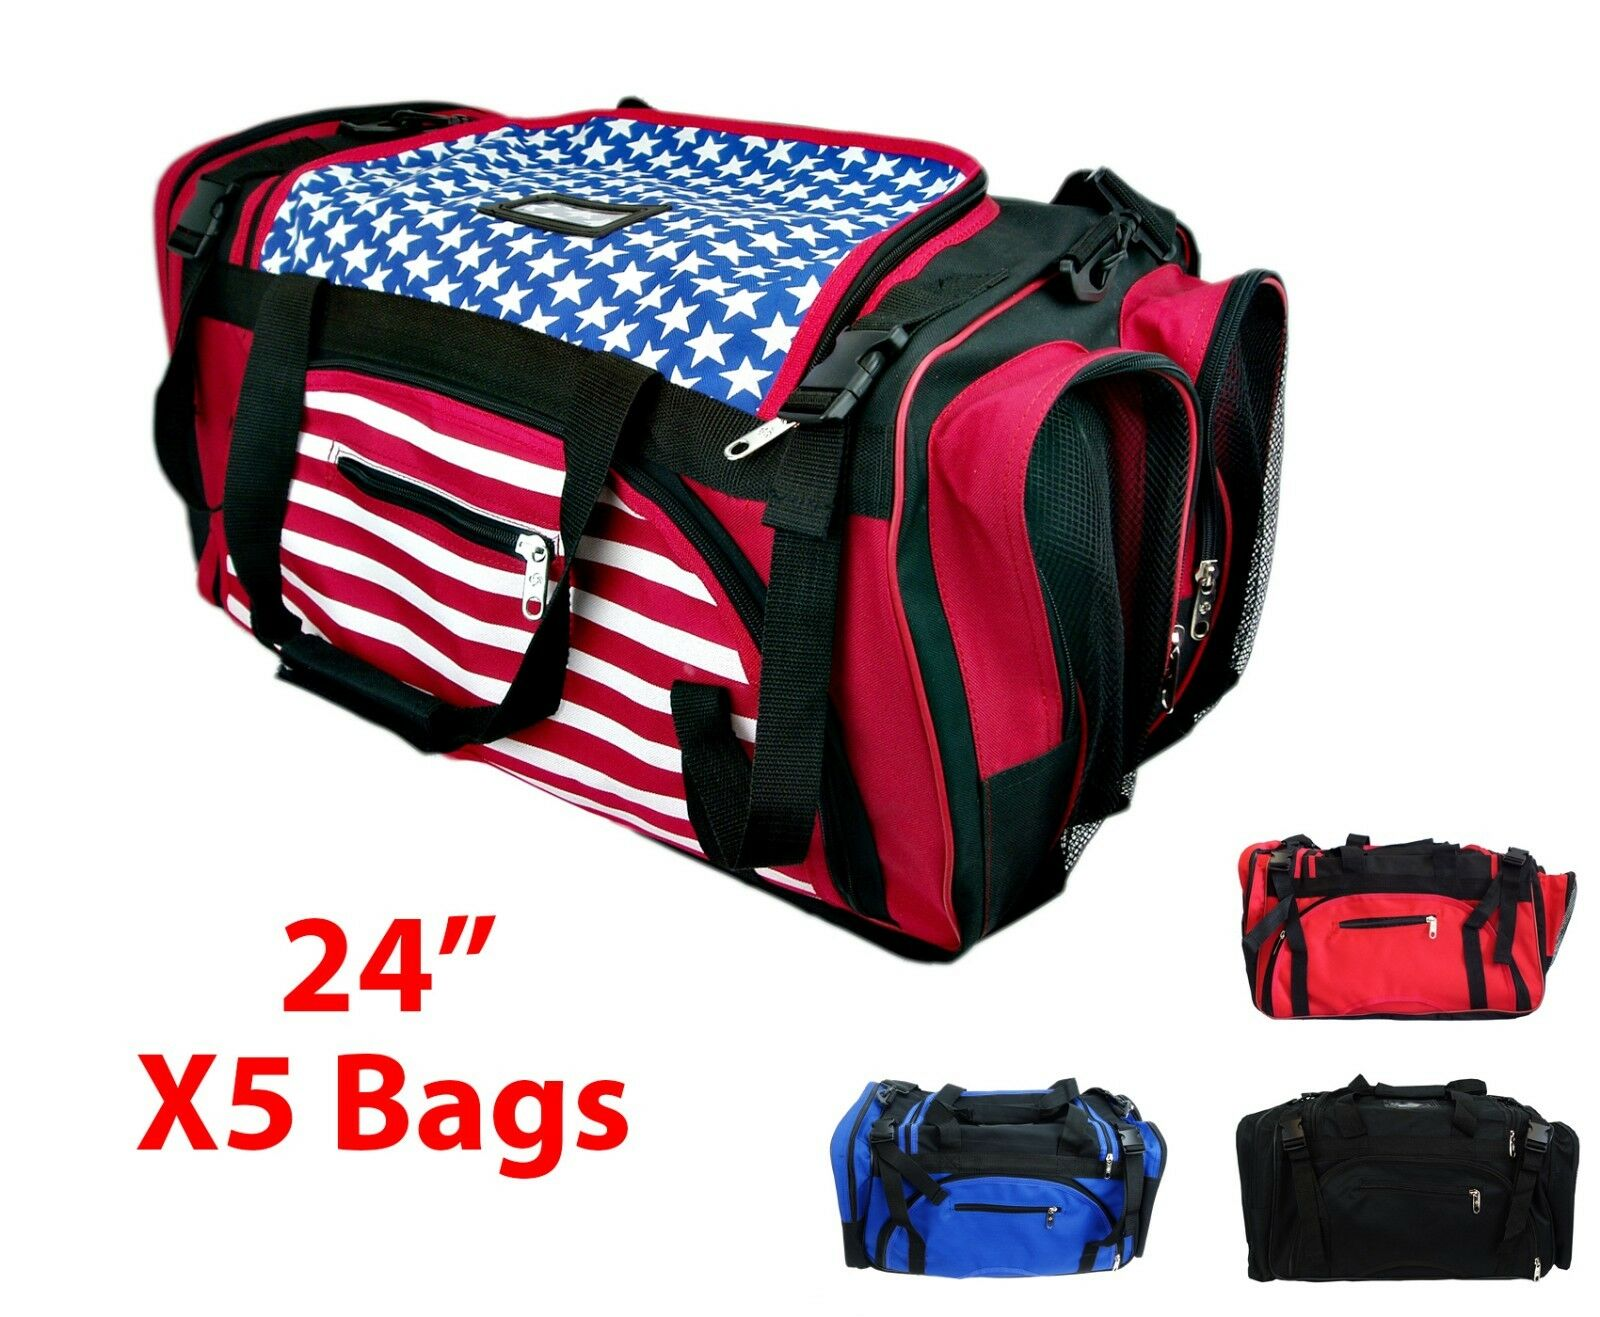 X5 Equipment Gear Bag Taekwondo Karate MMA  Martial Arts Deluxe 24  Travel Bag  will make you satisfied